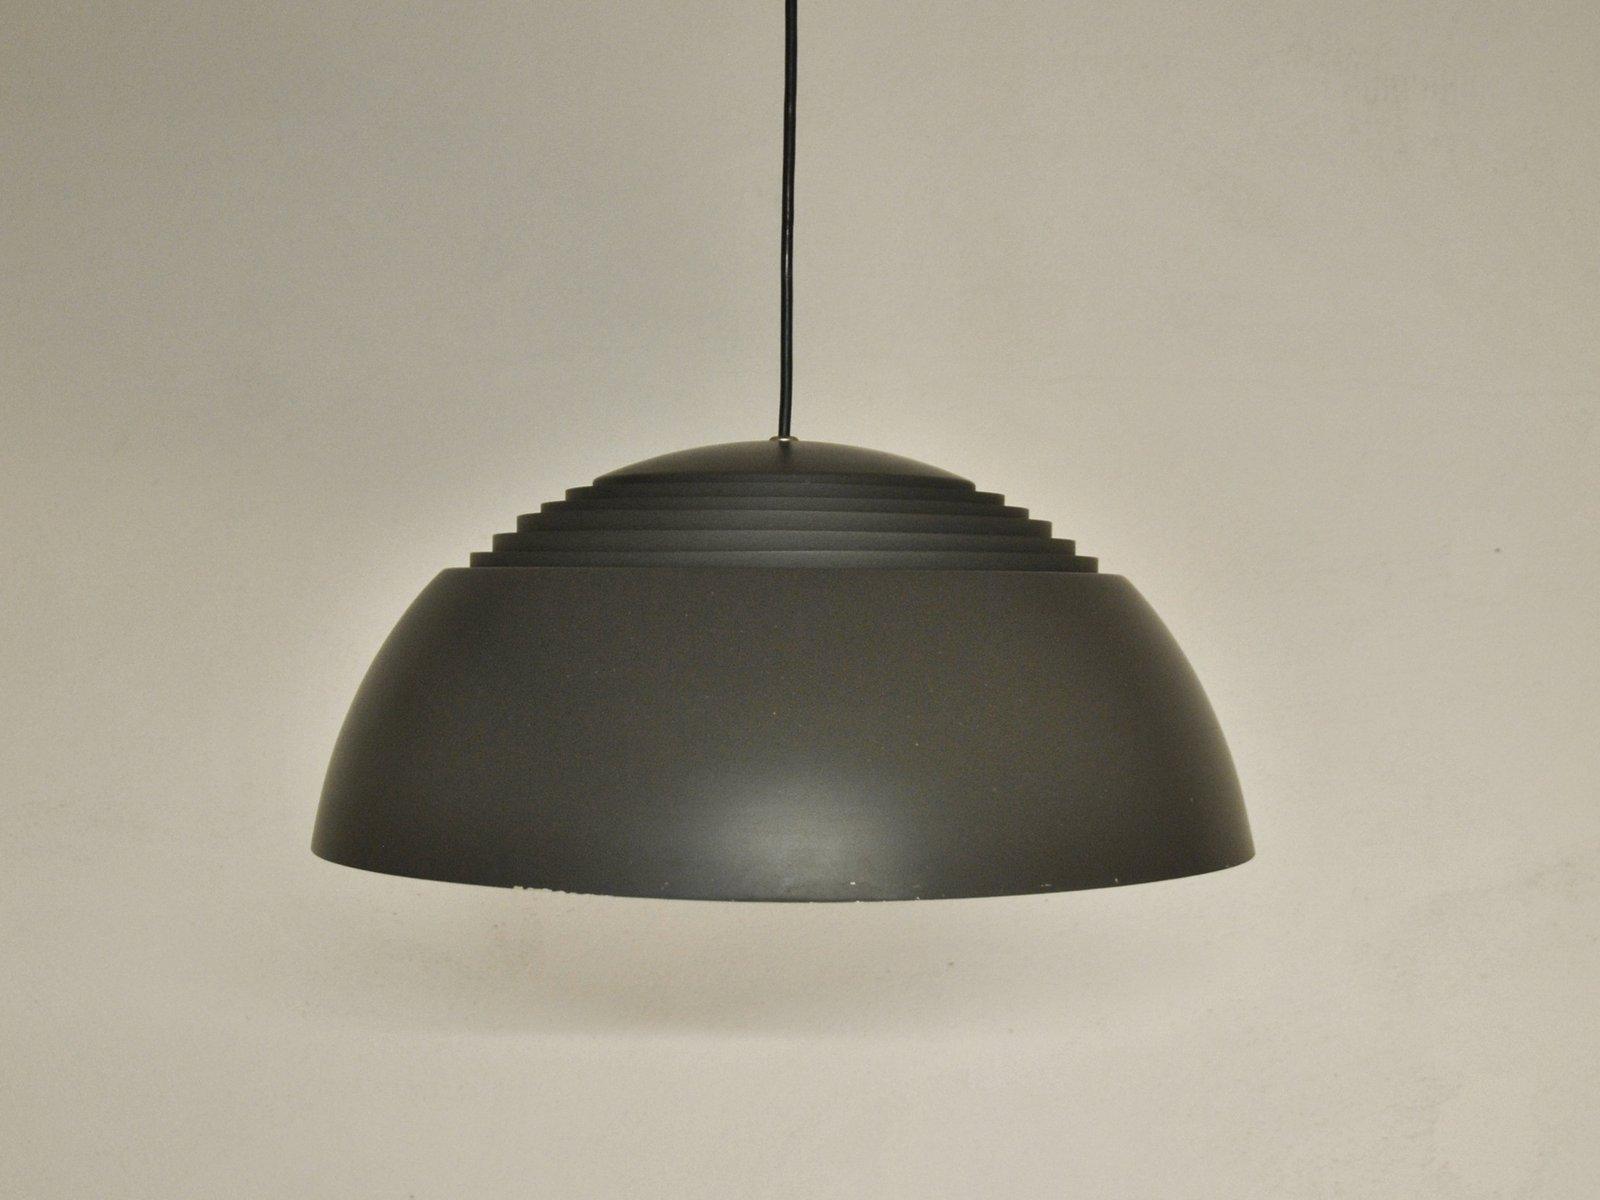 braune aj royal lampe von arne jacobsen f r louis poulsen bei pamono kaufen. Black Bedroom Furniture Sets. Home Design Ideas